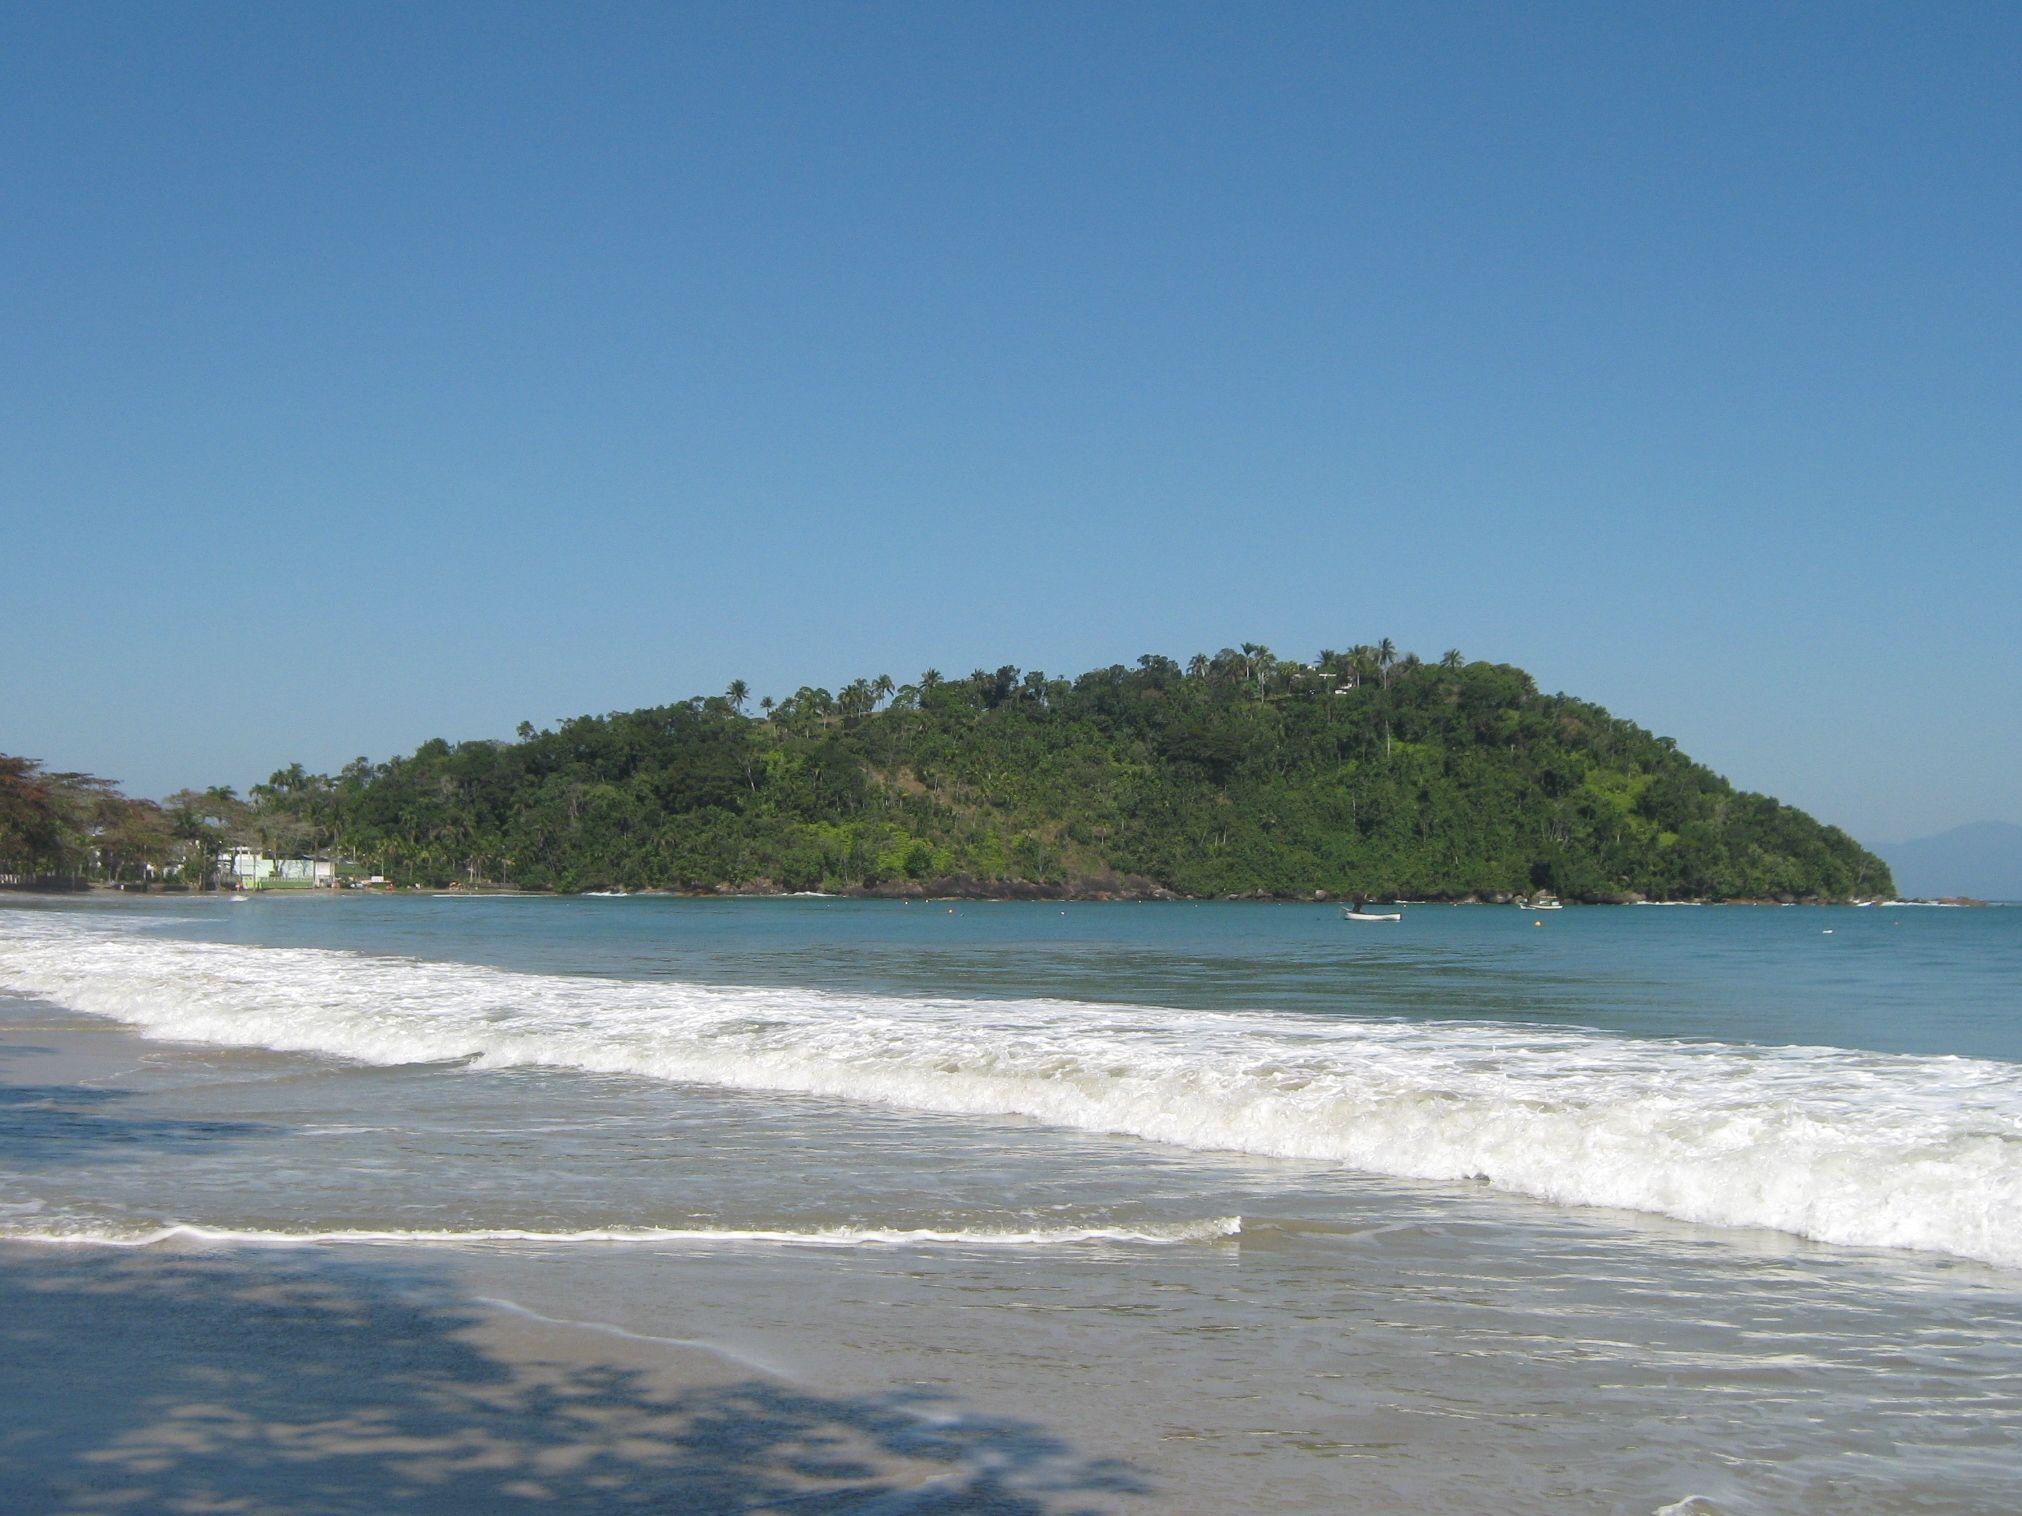 Conhecendo as praias de Ubatuba (SP)